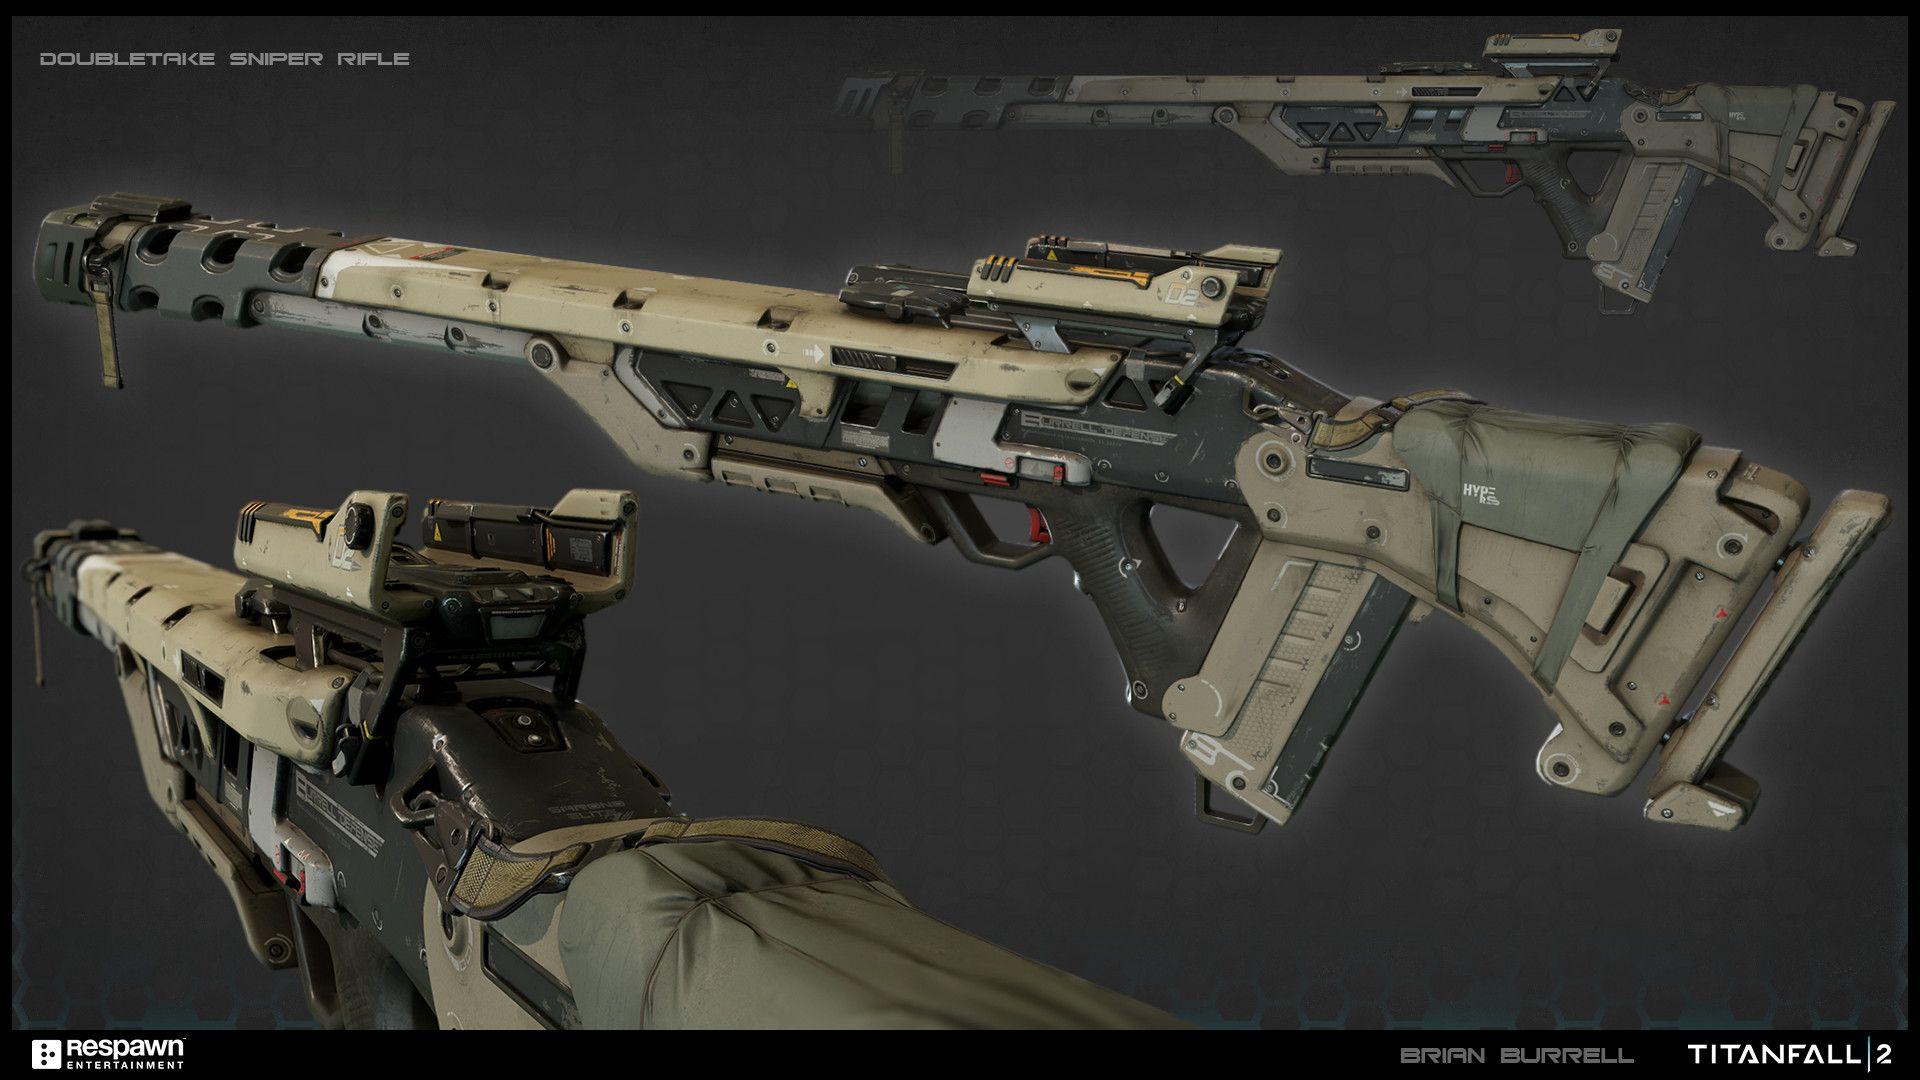 titanfall weapons minecraft mod - HD1920×1080